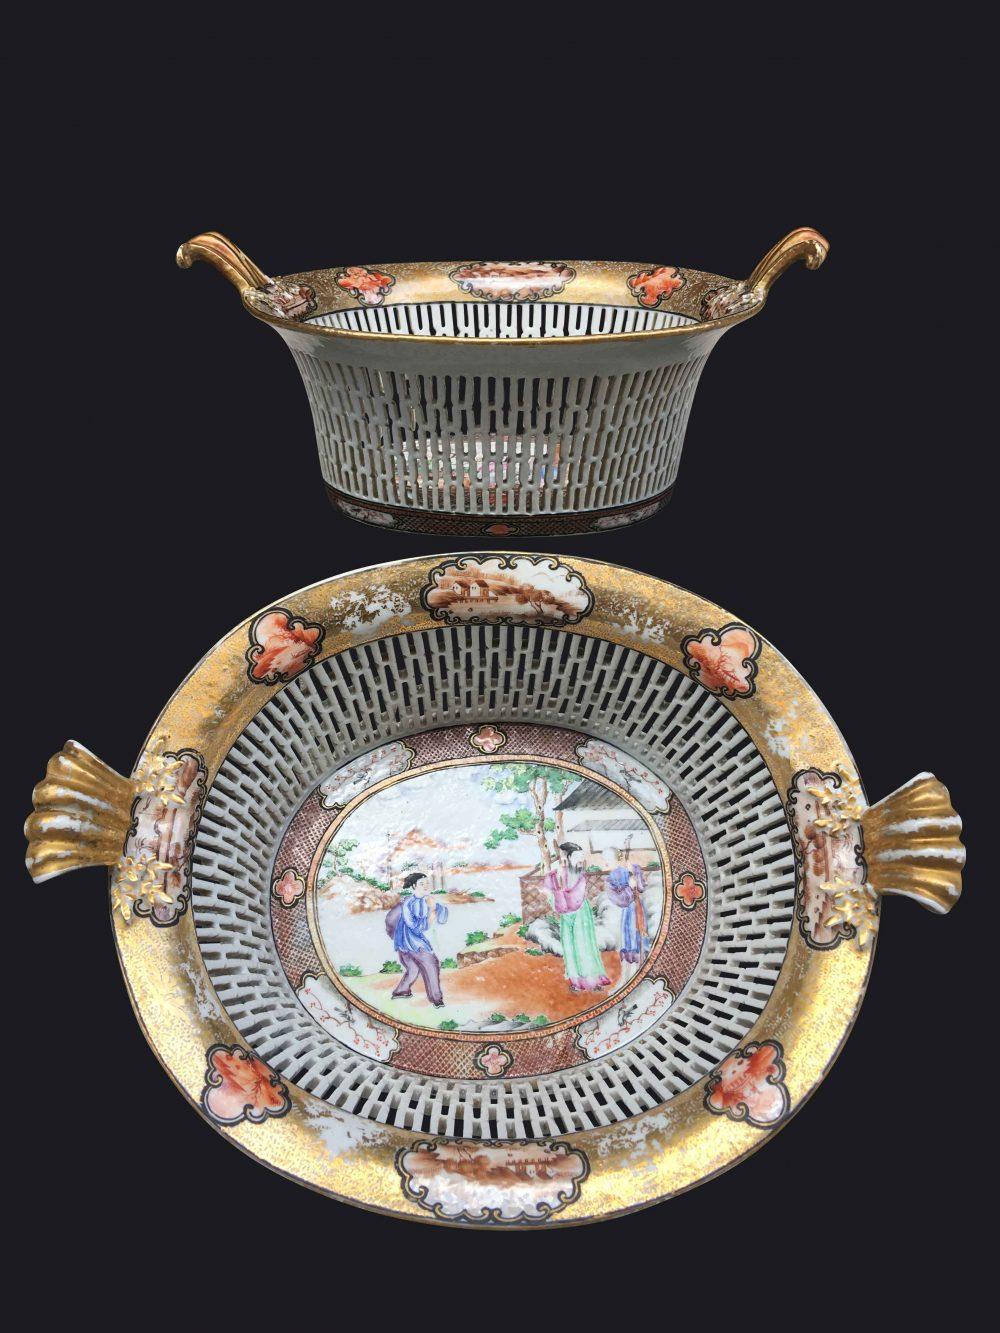 Famille rose Porcelain Late Qianlong (1736-1795), circa 1790-1800, China